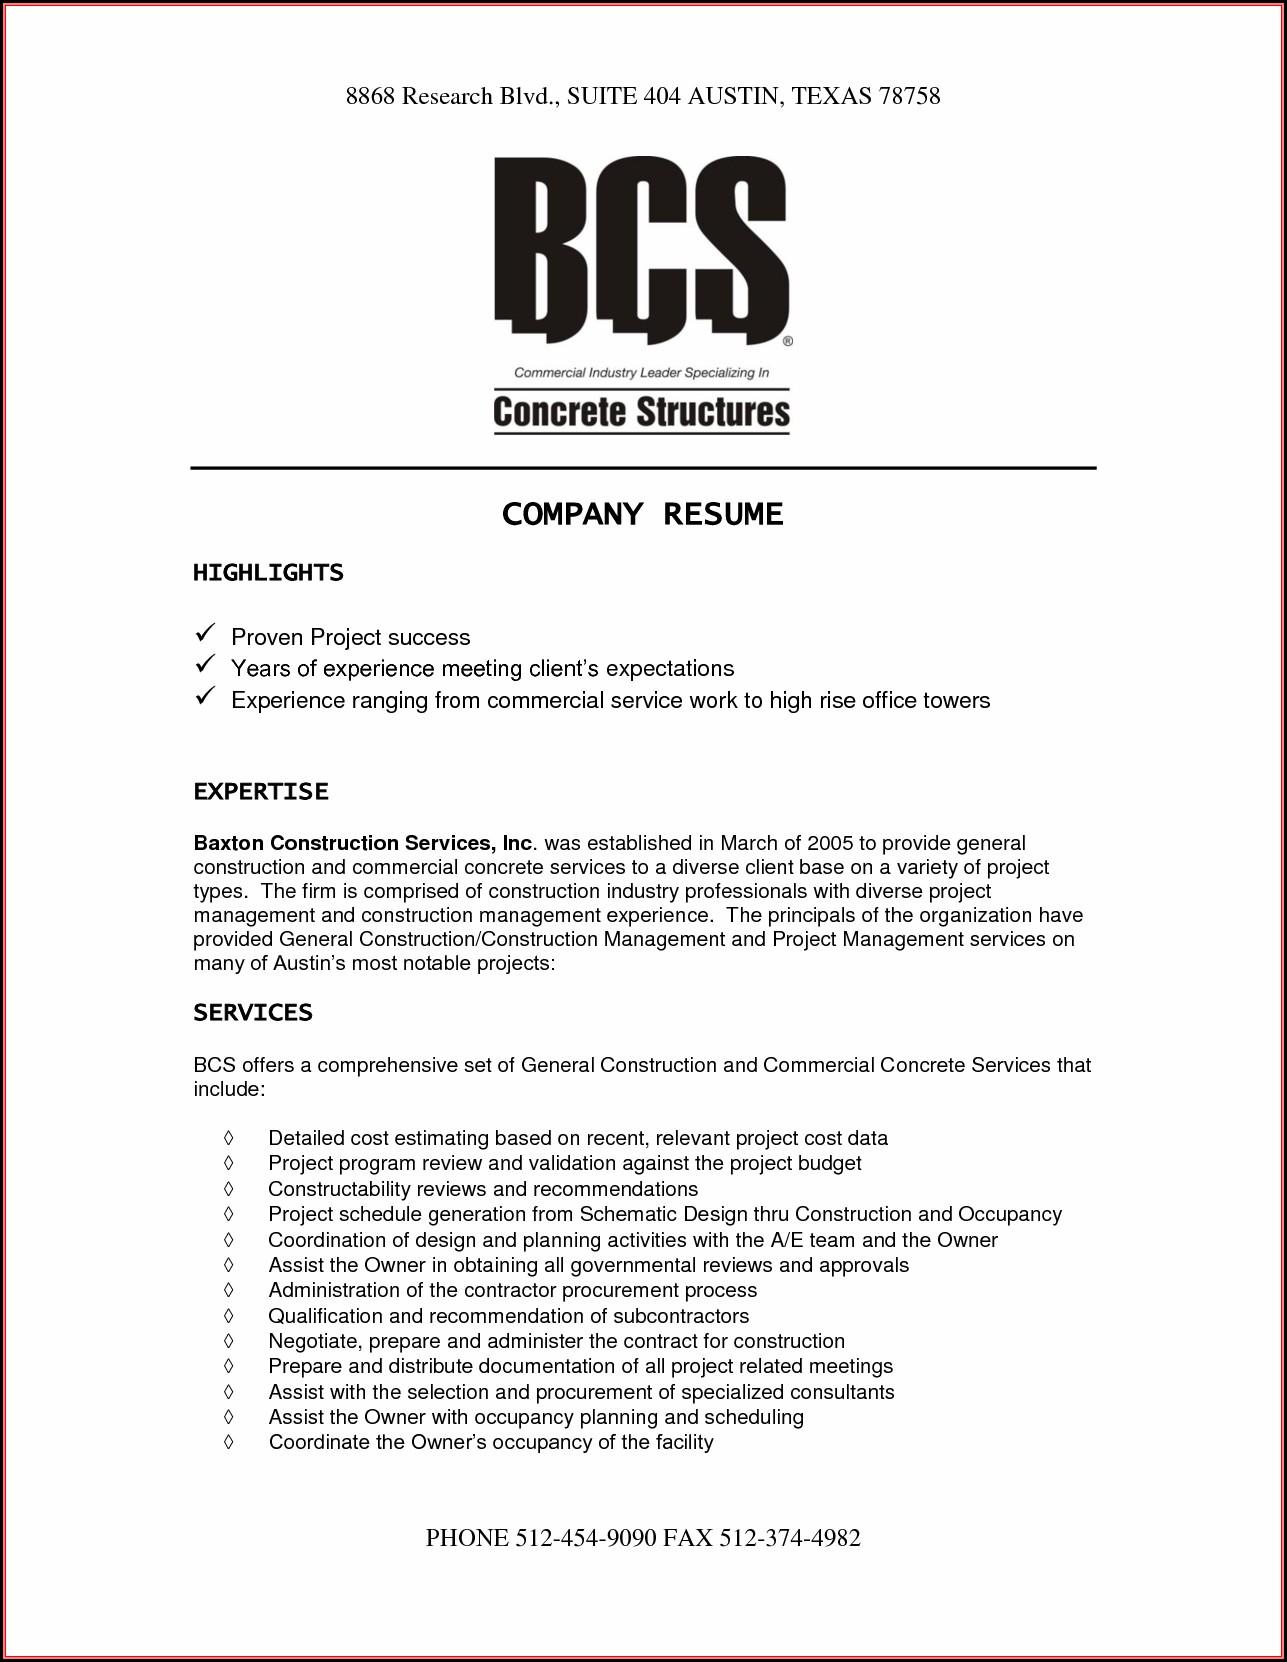 Sample Company Resume Templates